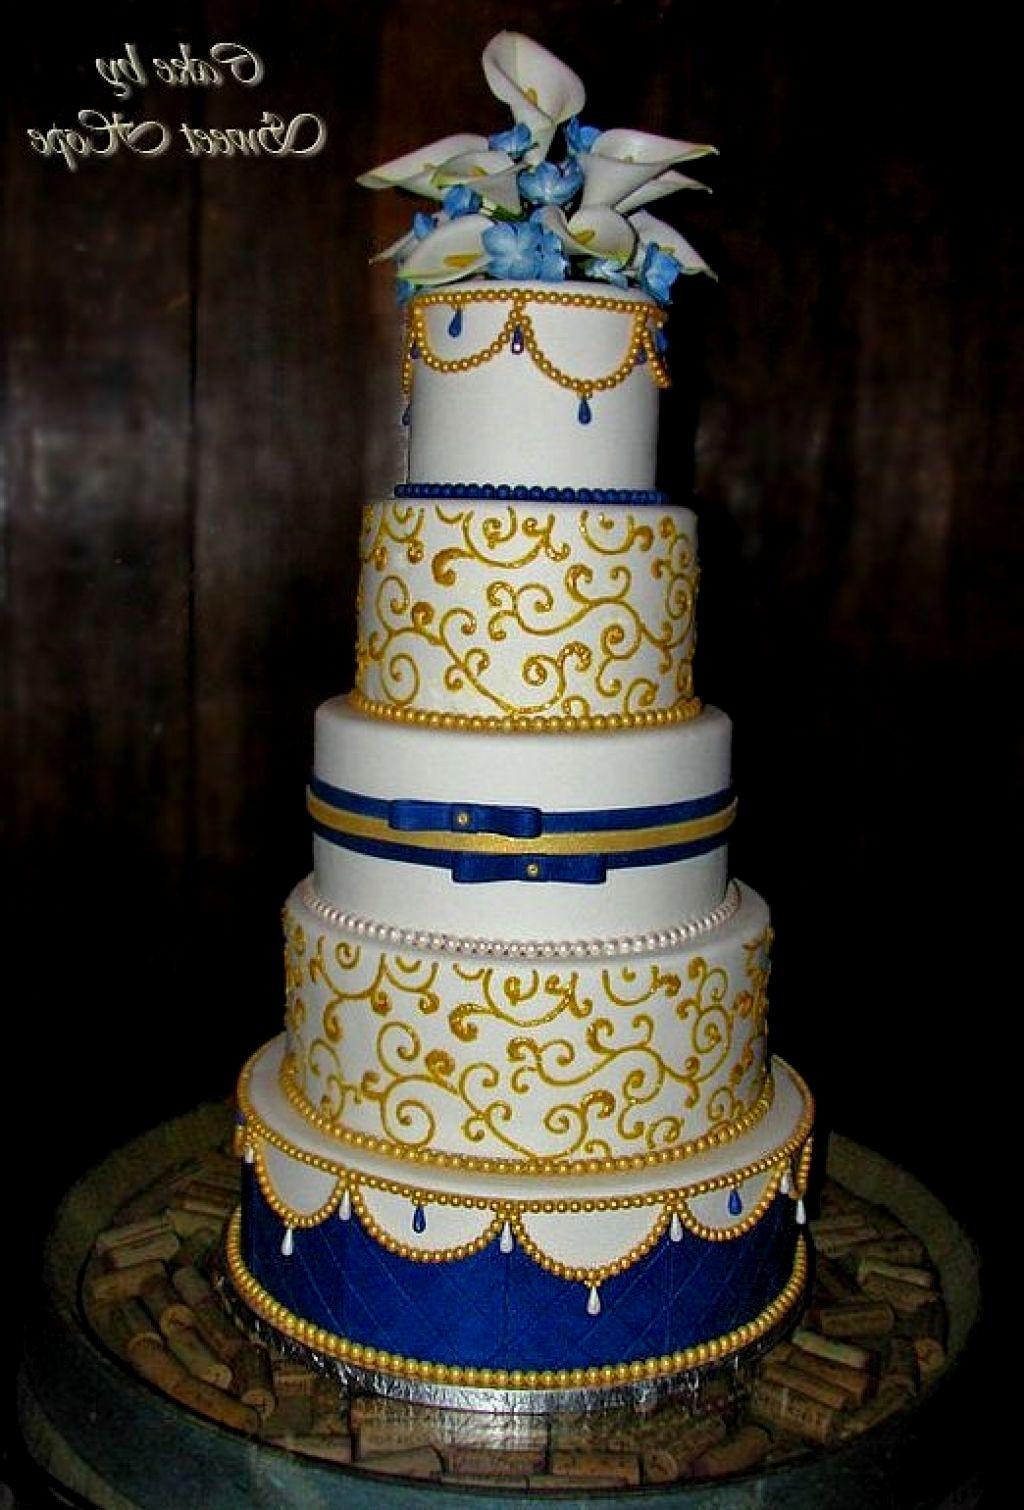 Royal Blue And Gold Wedding Cakes  Royal blue and gold wedding cakes idea in 2017